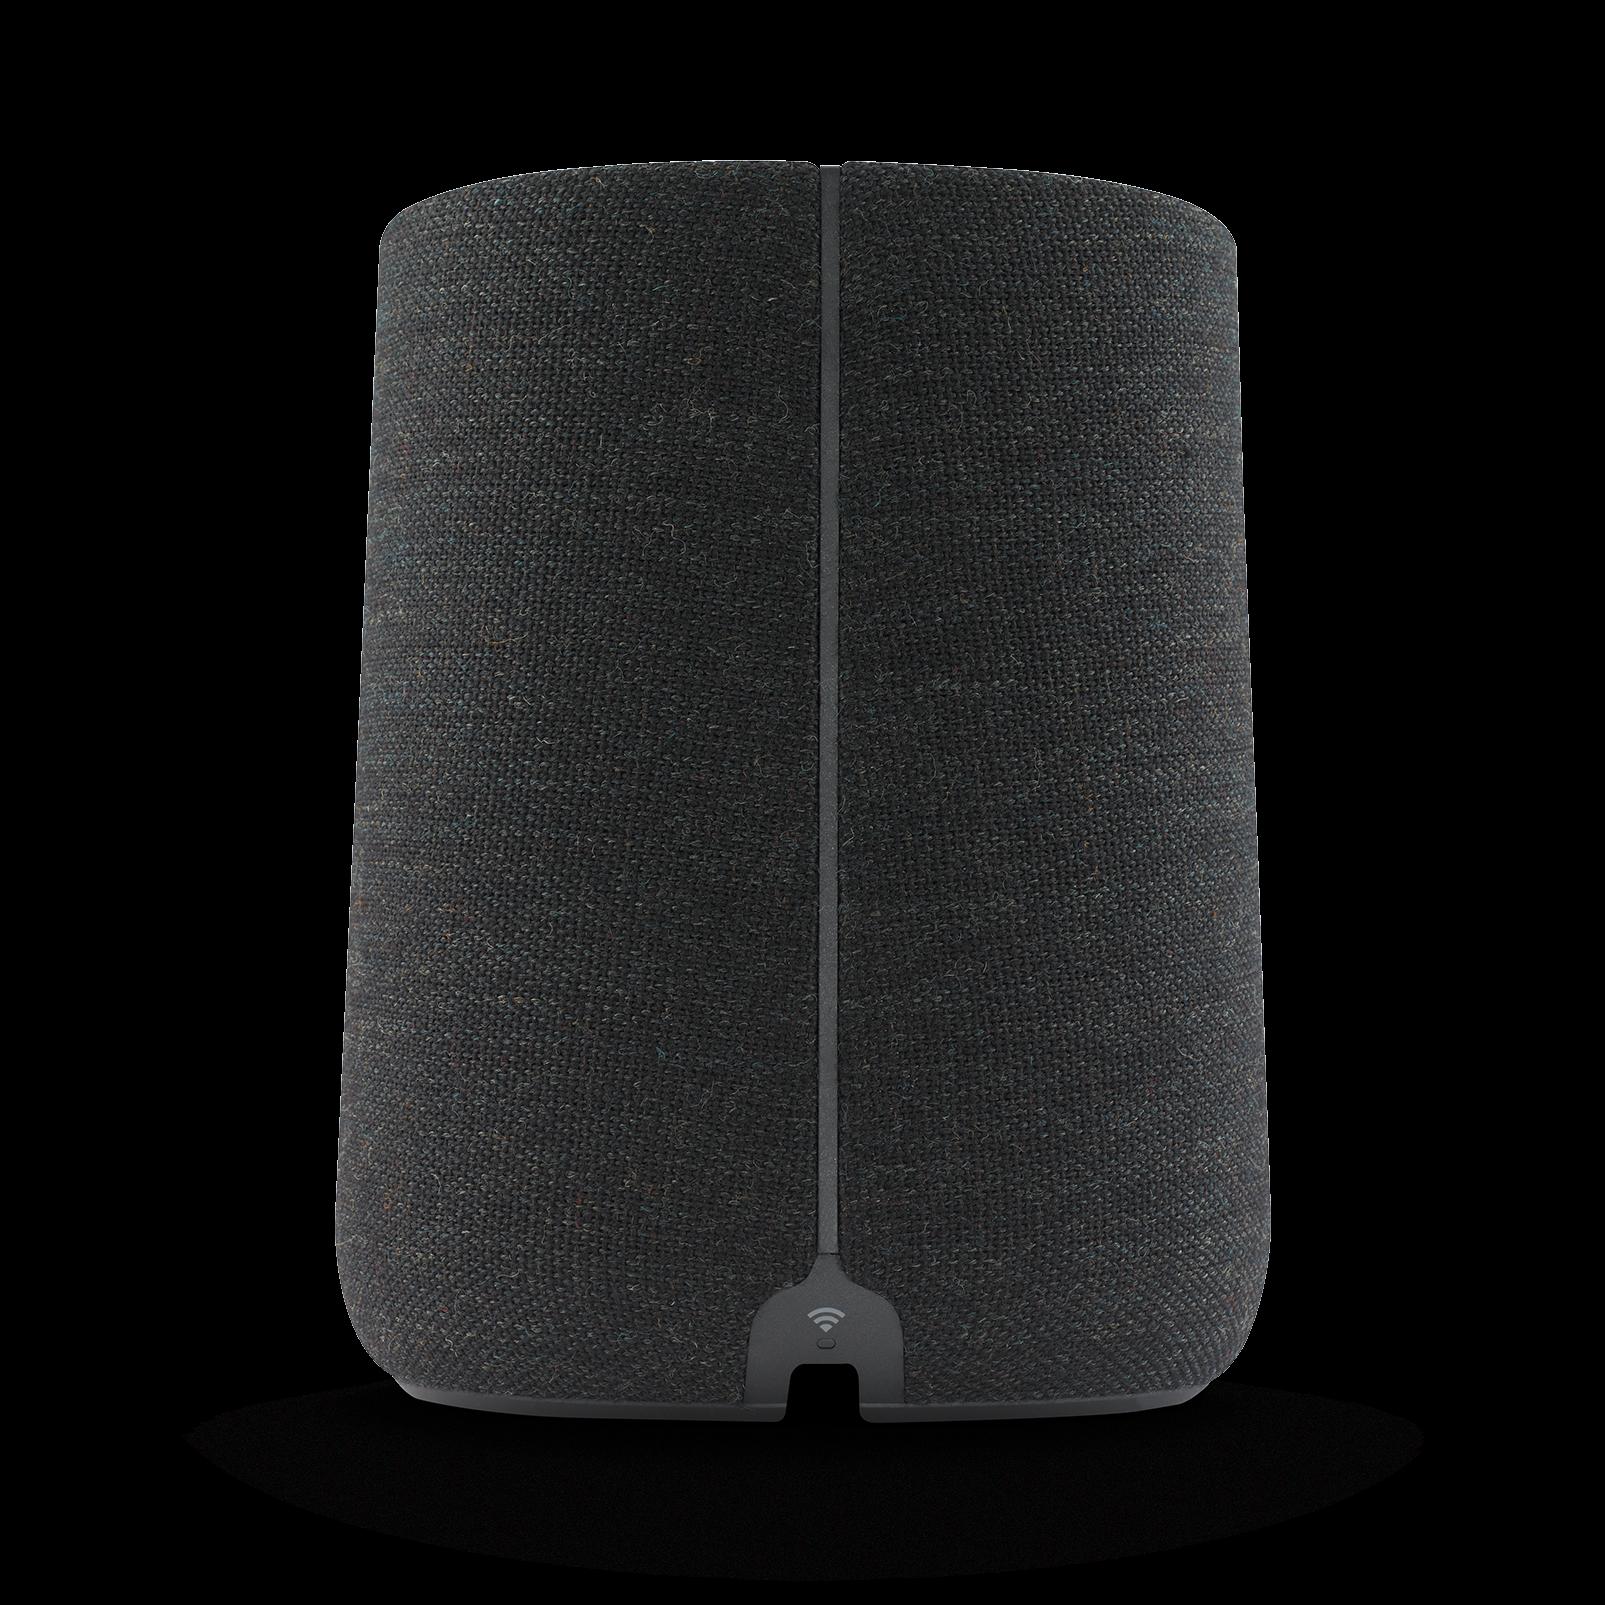 Harman Kardon Citation One MKII - Black - All-in-one smart speaker with room-filling sound - Back